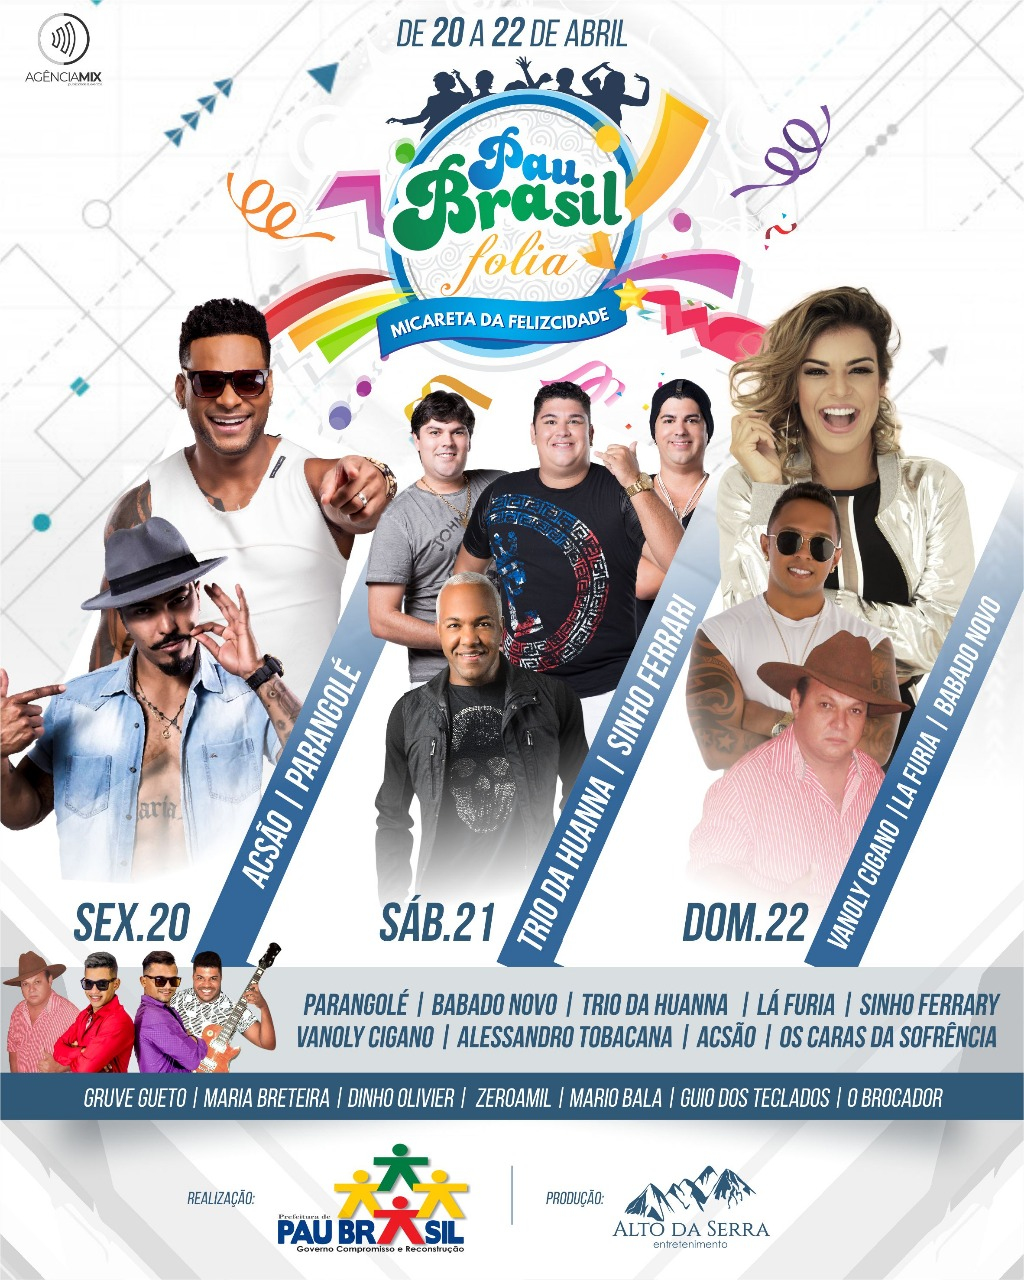 PAU BRASIL FOLIA - DE 20 A 22 ABRIL